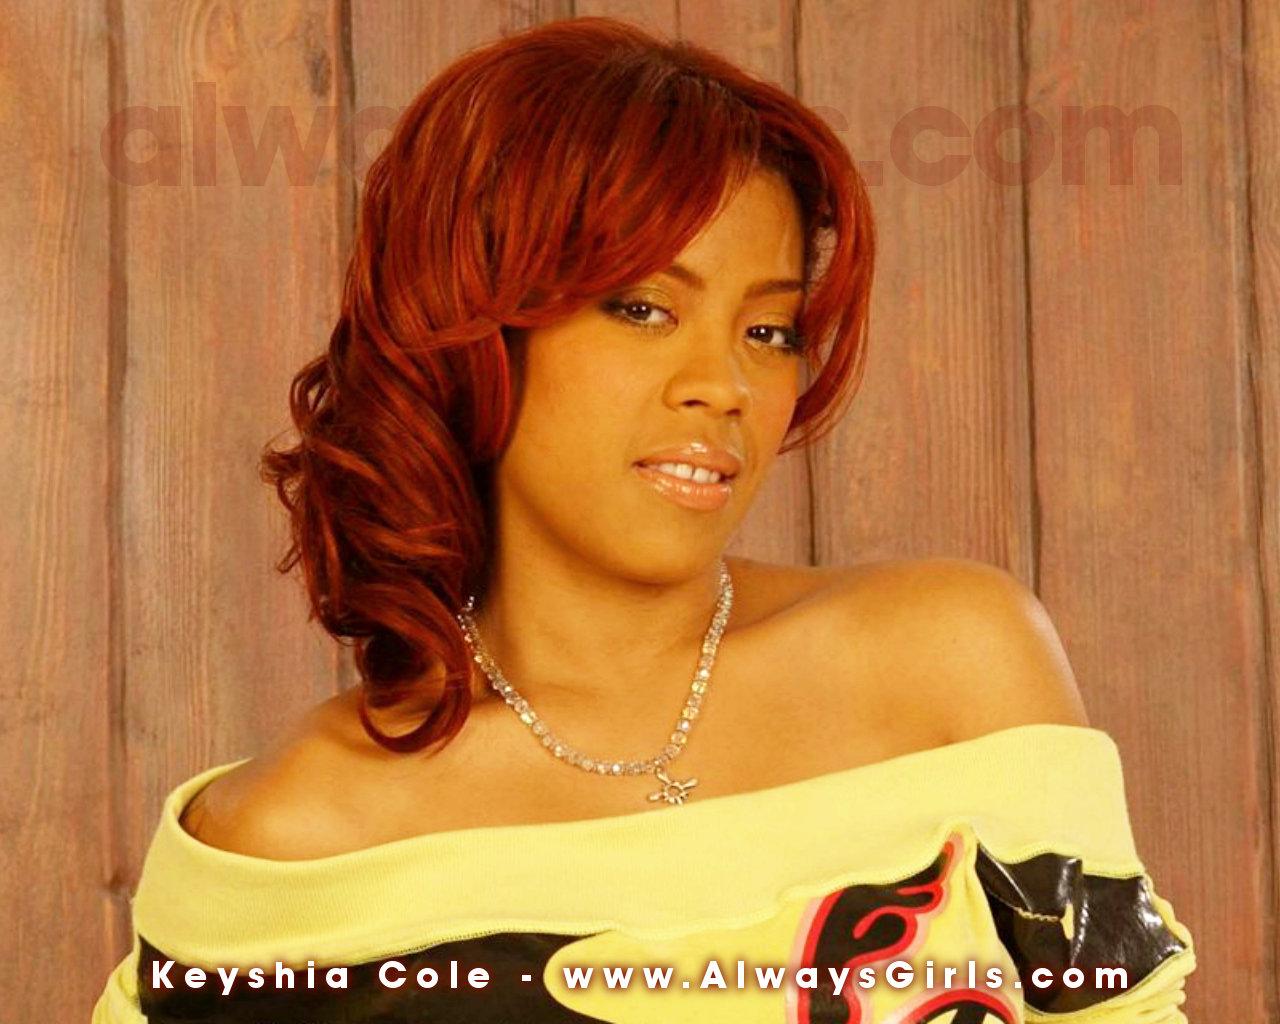 Keyshia Cole Hairstyle Trends: Keyshia Cole Hairstyle ...